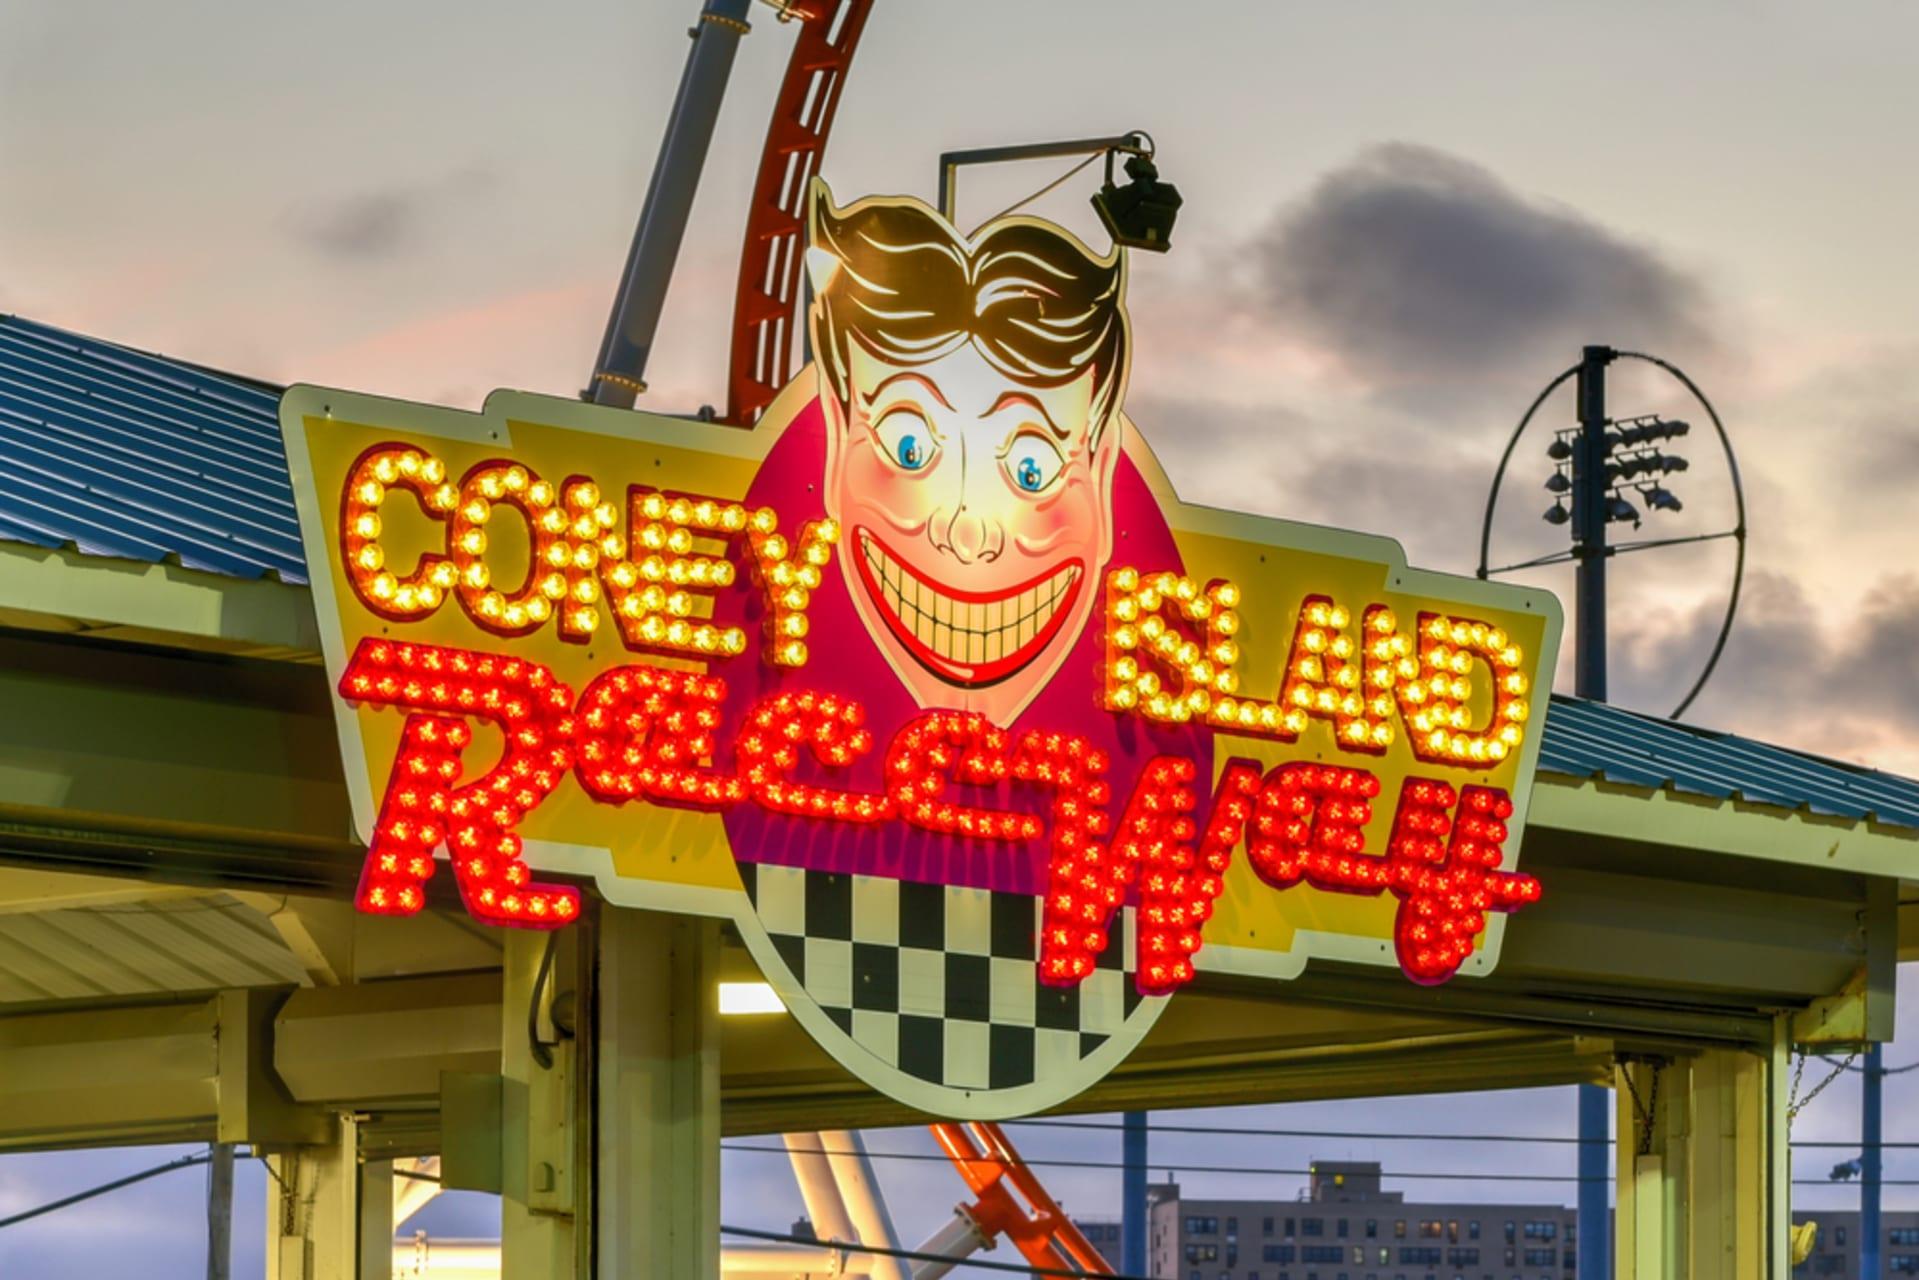 New York - New York at Night: Coney Island